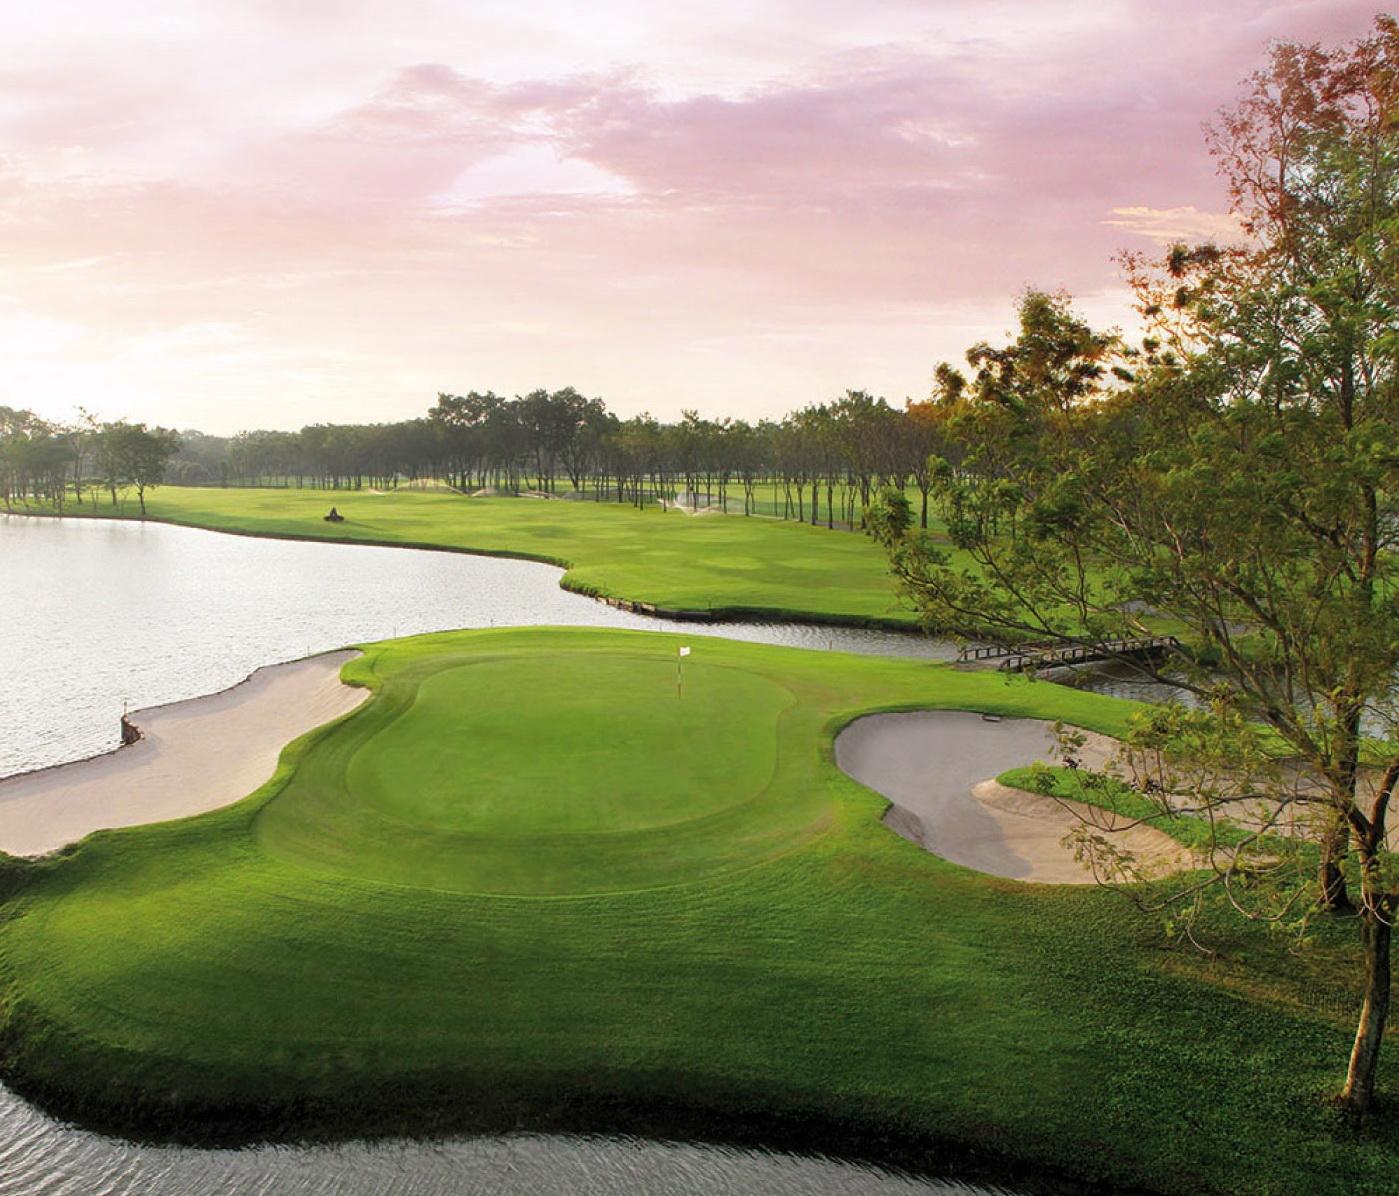 Eランクのゴルフ場